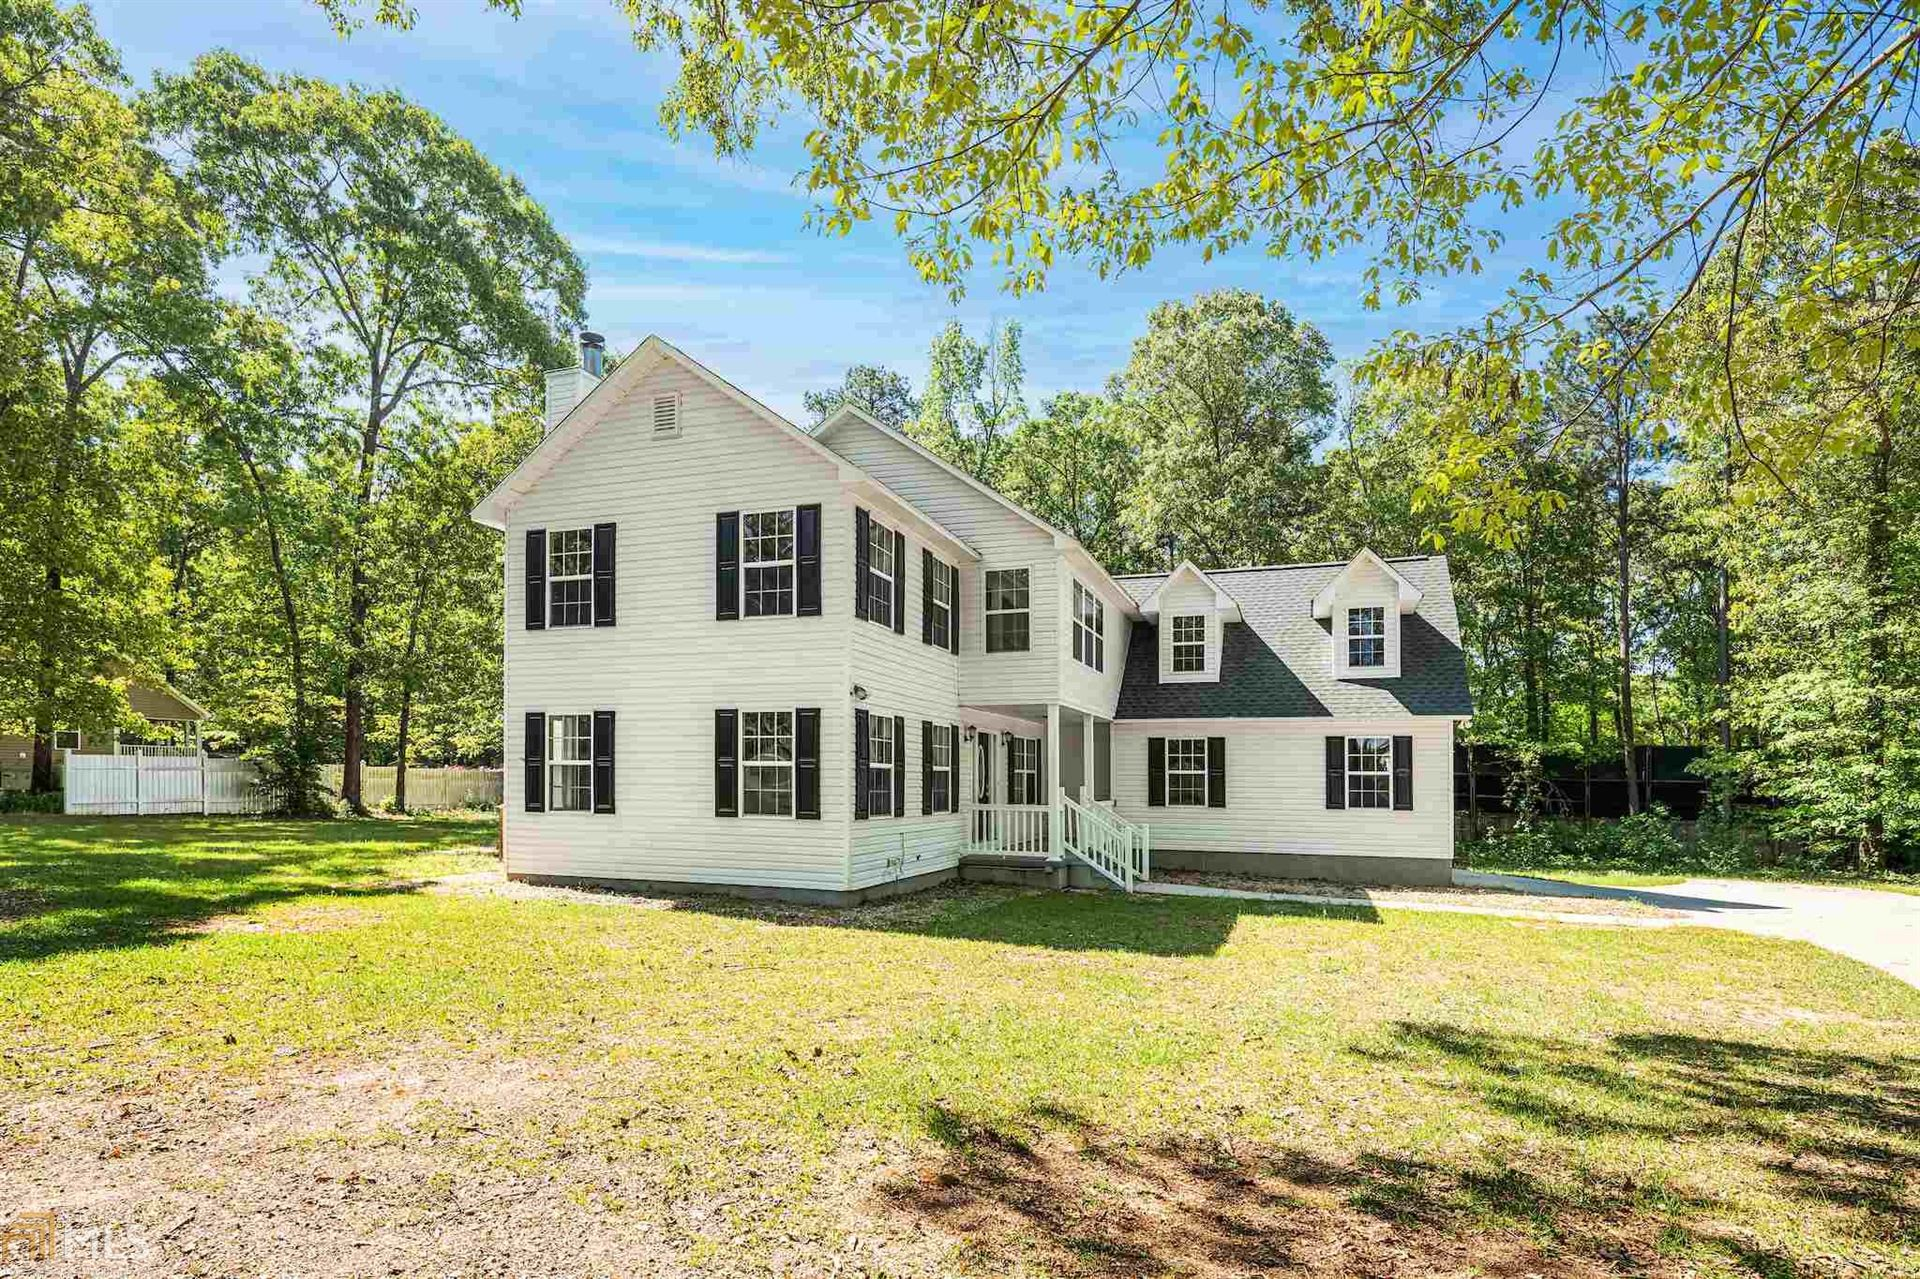 Photo of 319 Hardwood Holw, Sandersville, GA 31082 (MLS # 8961917)